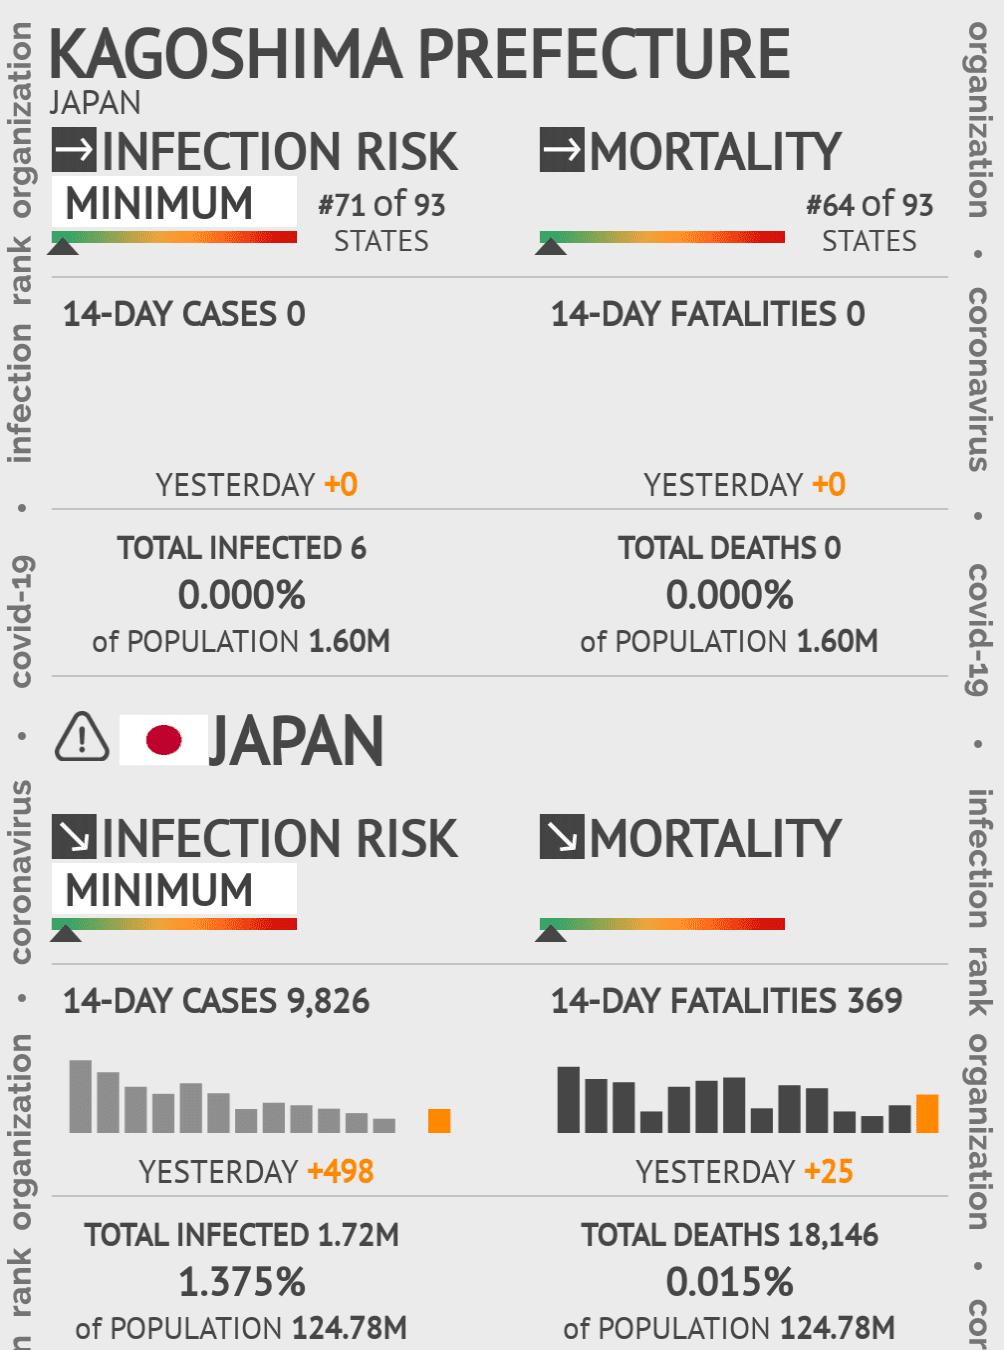 Kagoshima Prefecture Coronavirus Covid-19 Risk of Infection on May 14, 2020